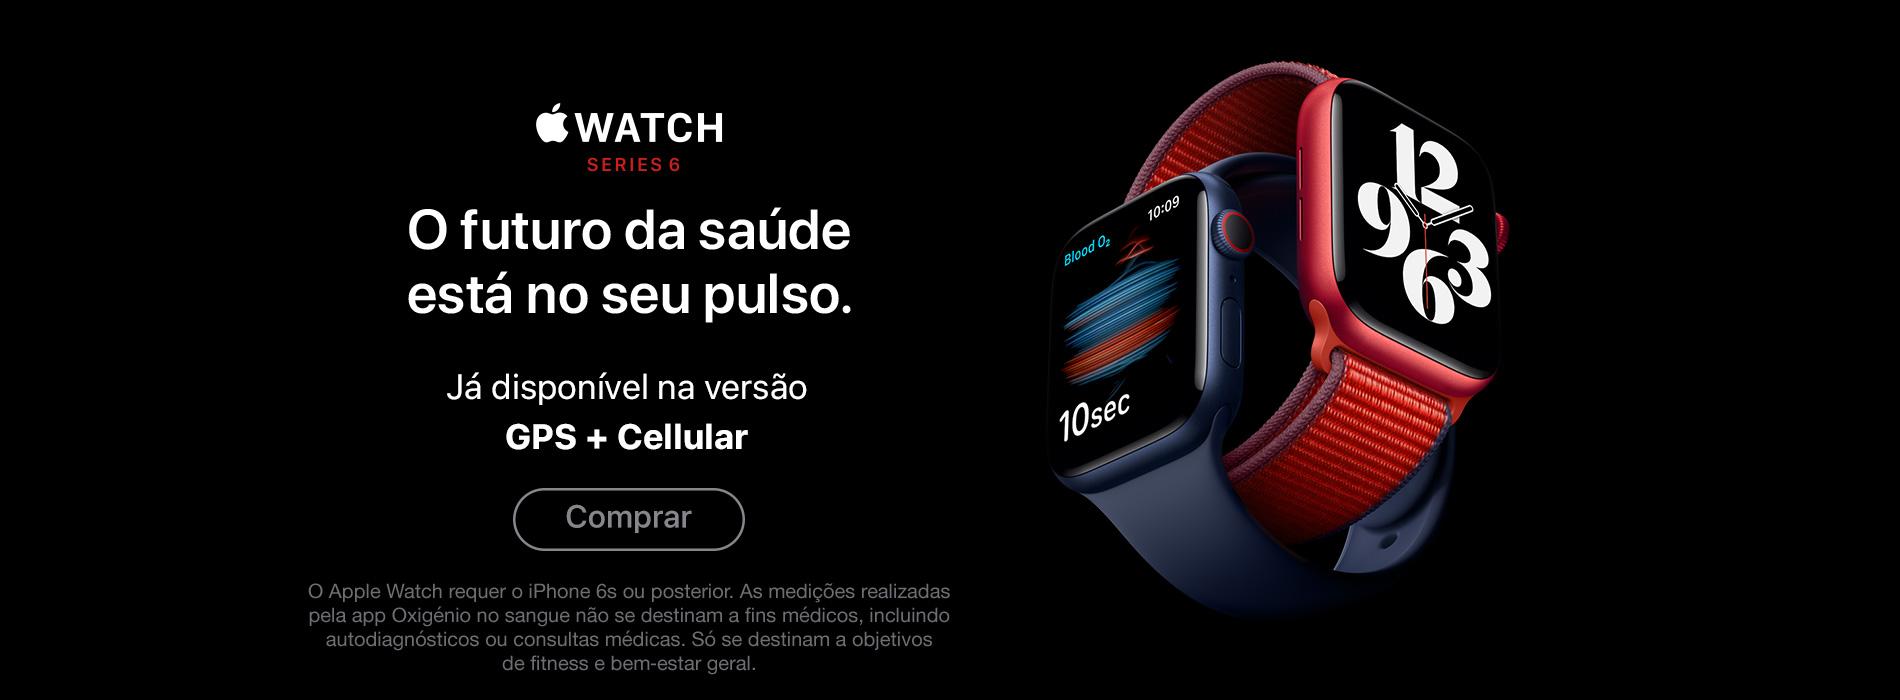 Homepage Slideshow - NPI Watch Series 6 GPS + Cellular